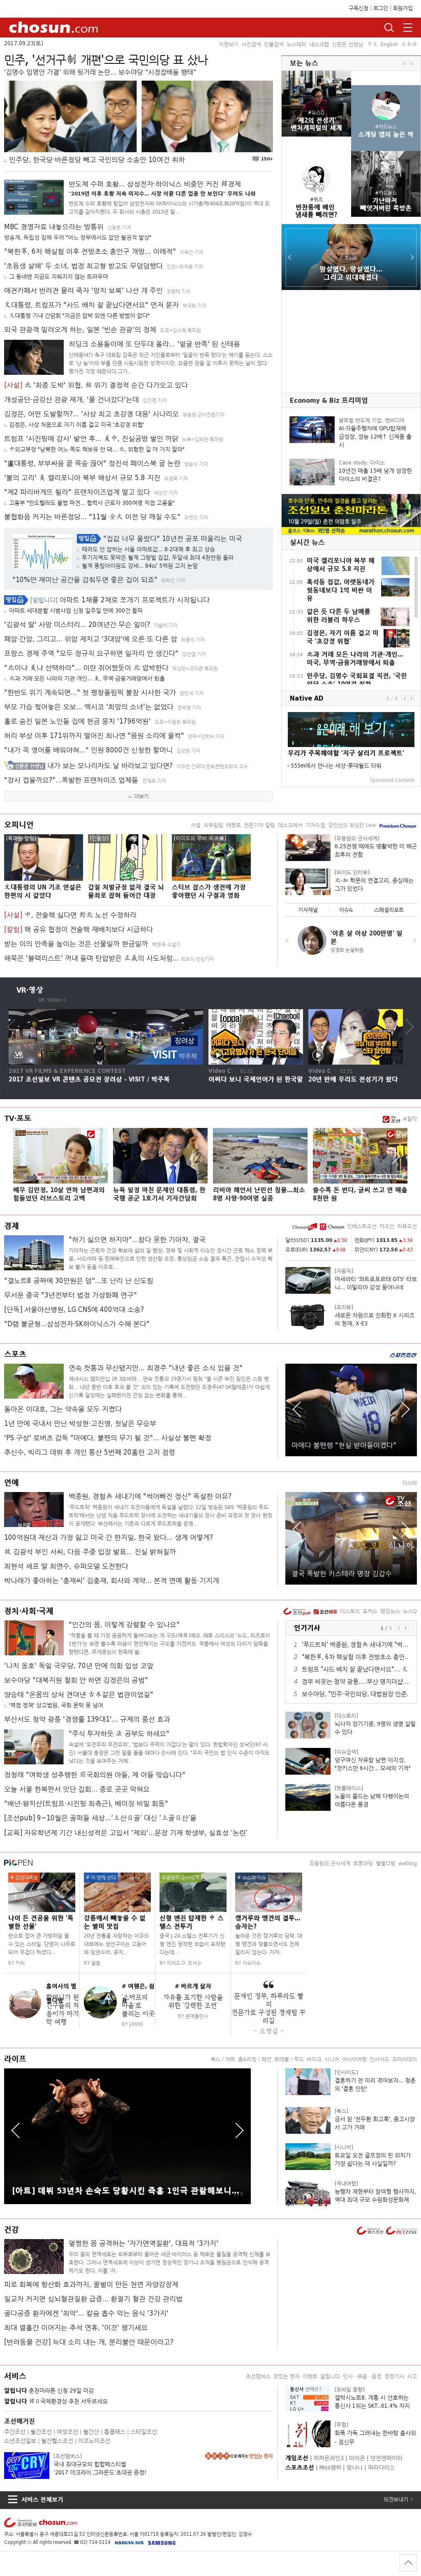 chosun.com at Saturday Sept. 23, 2017, 12:02 a.m. UTC